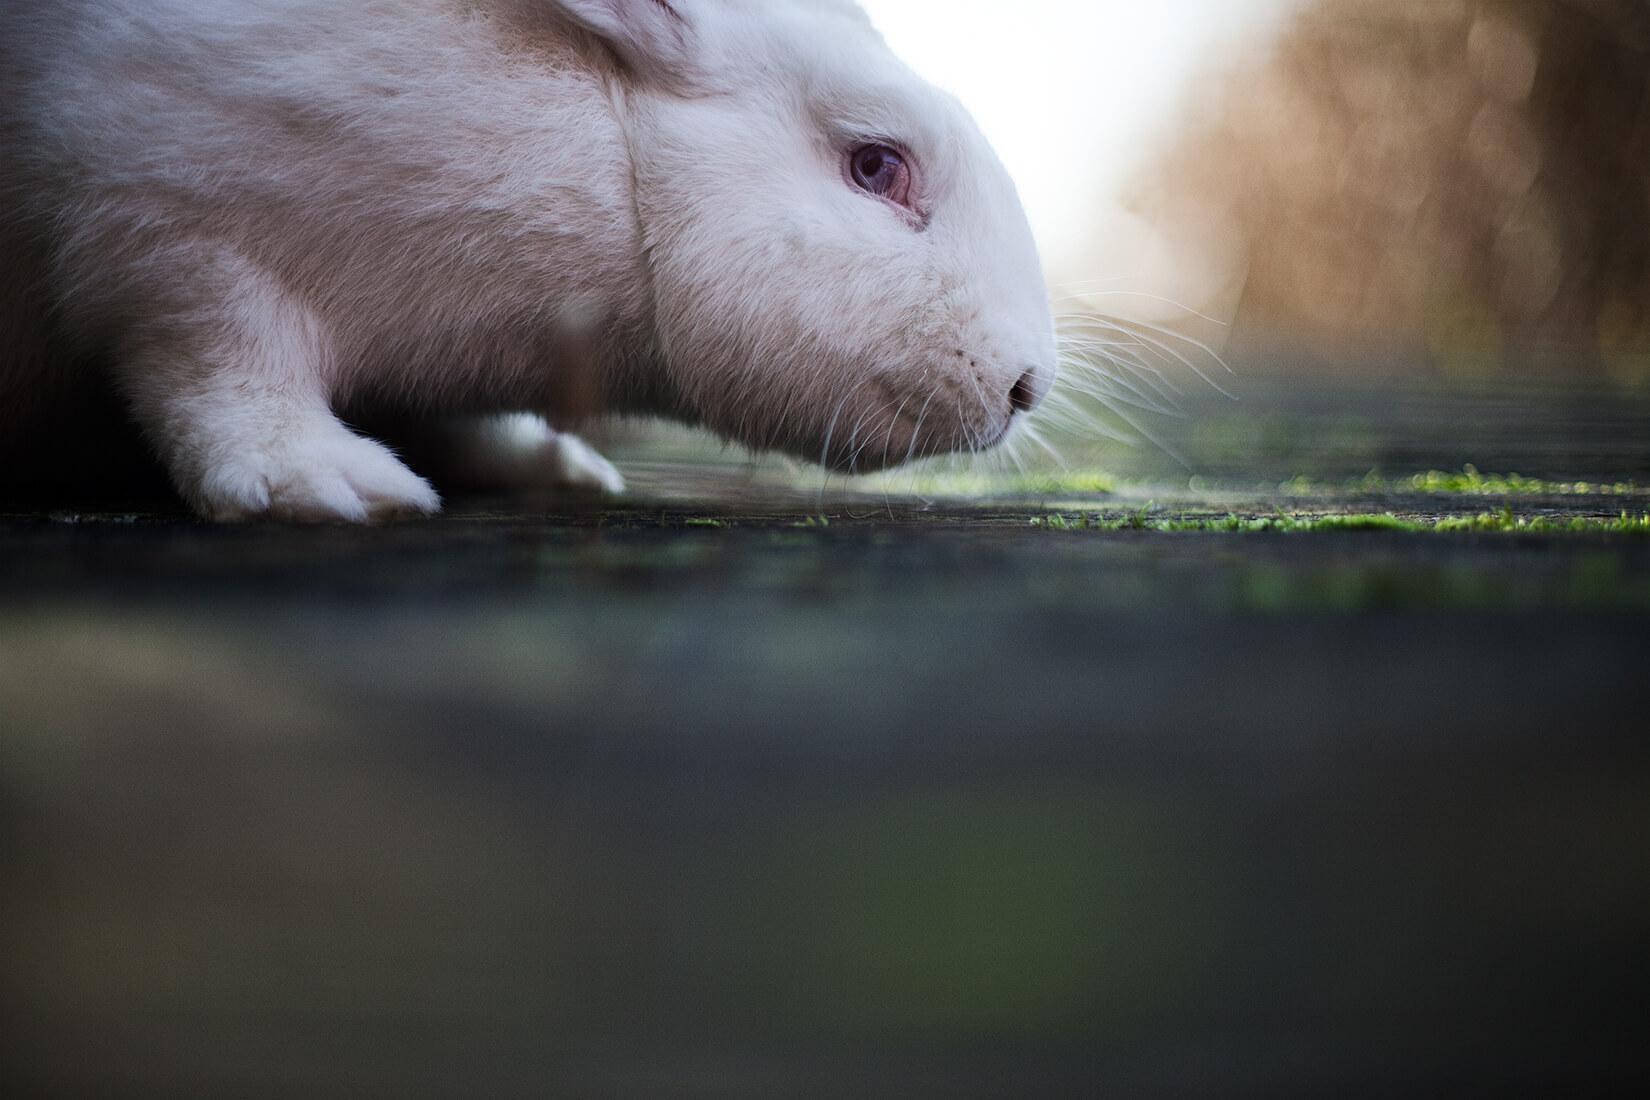 photography portrait project study rabbit albino